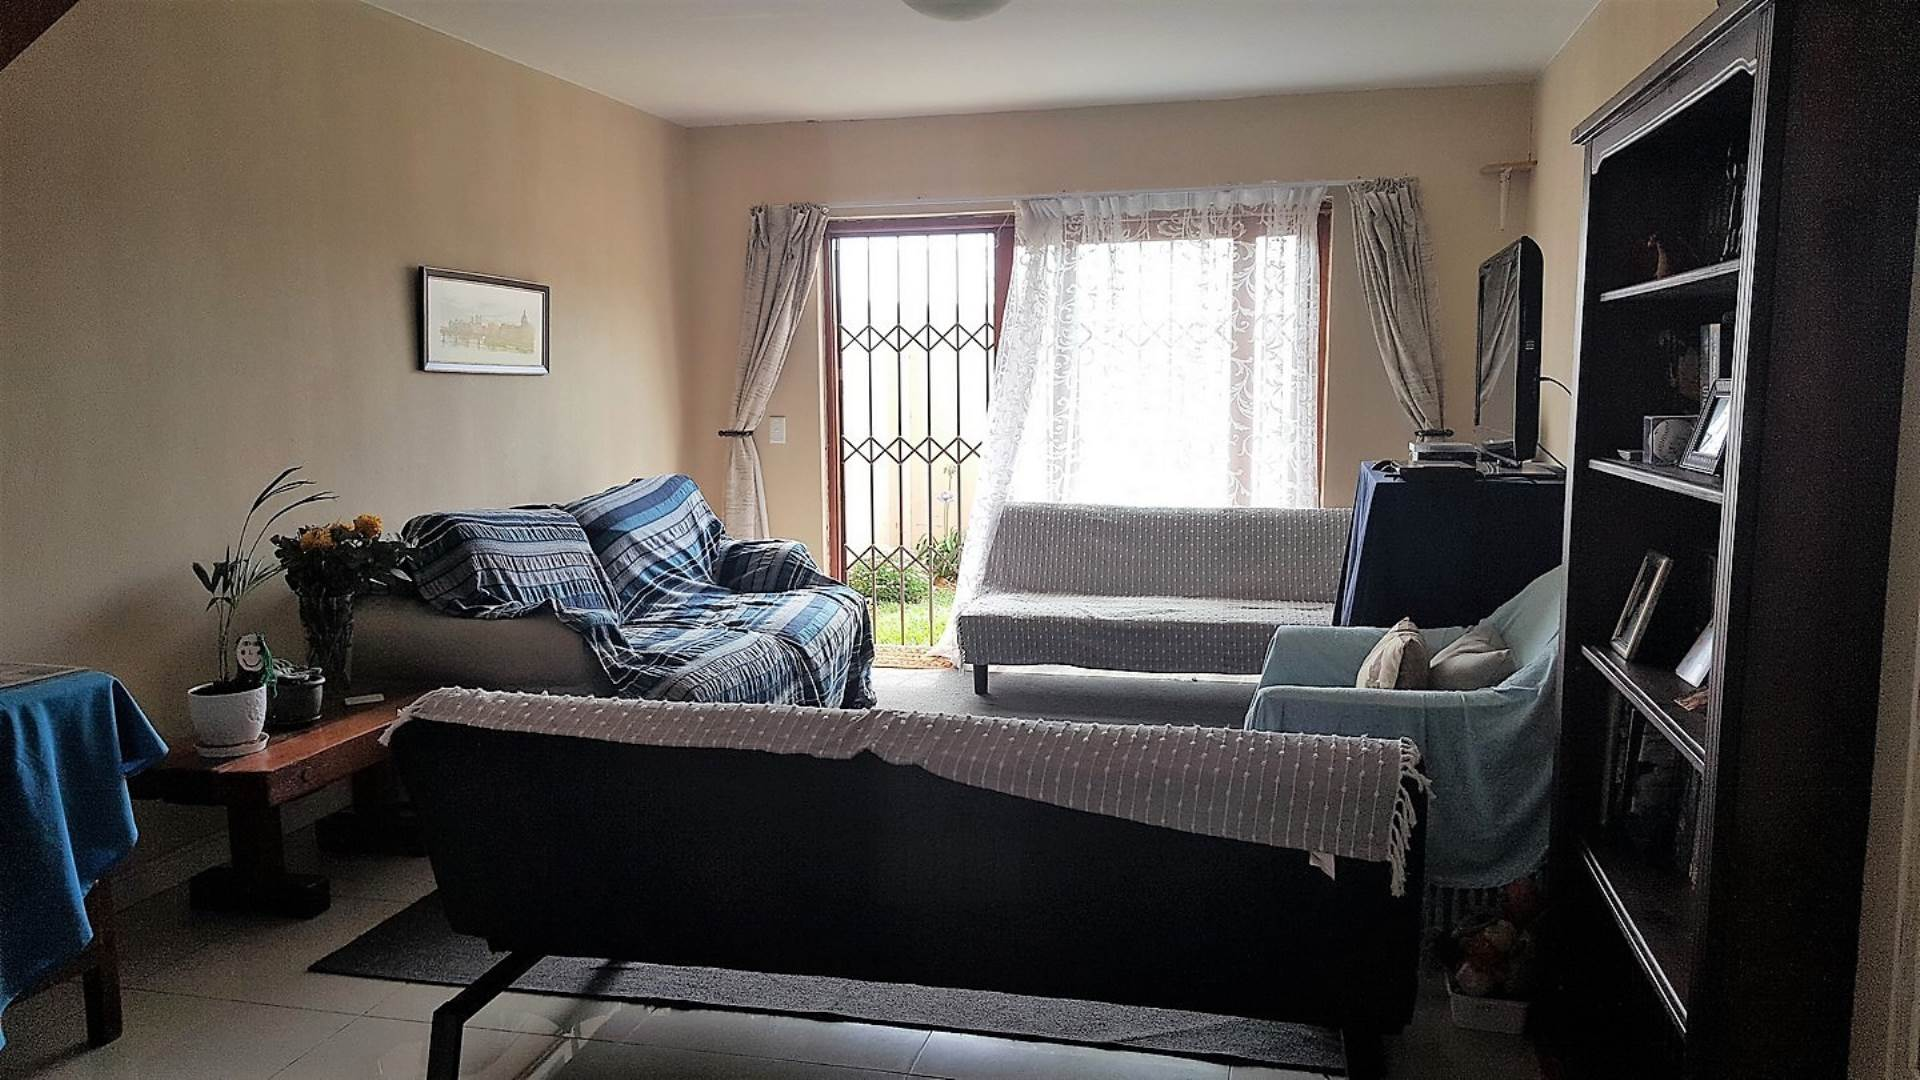 2 BedroomTownhouse To Rent In Suideroord